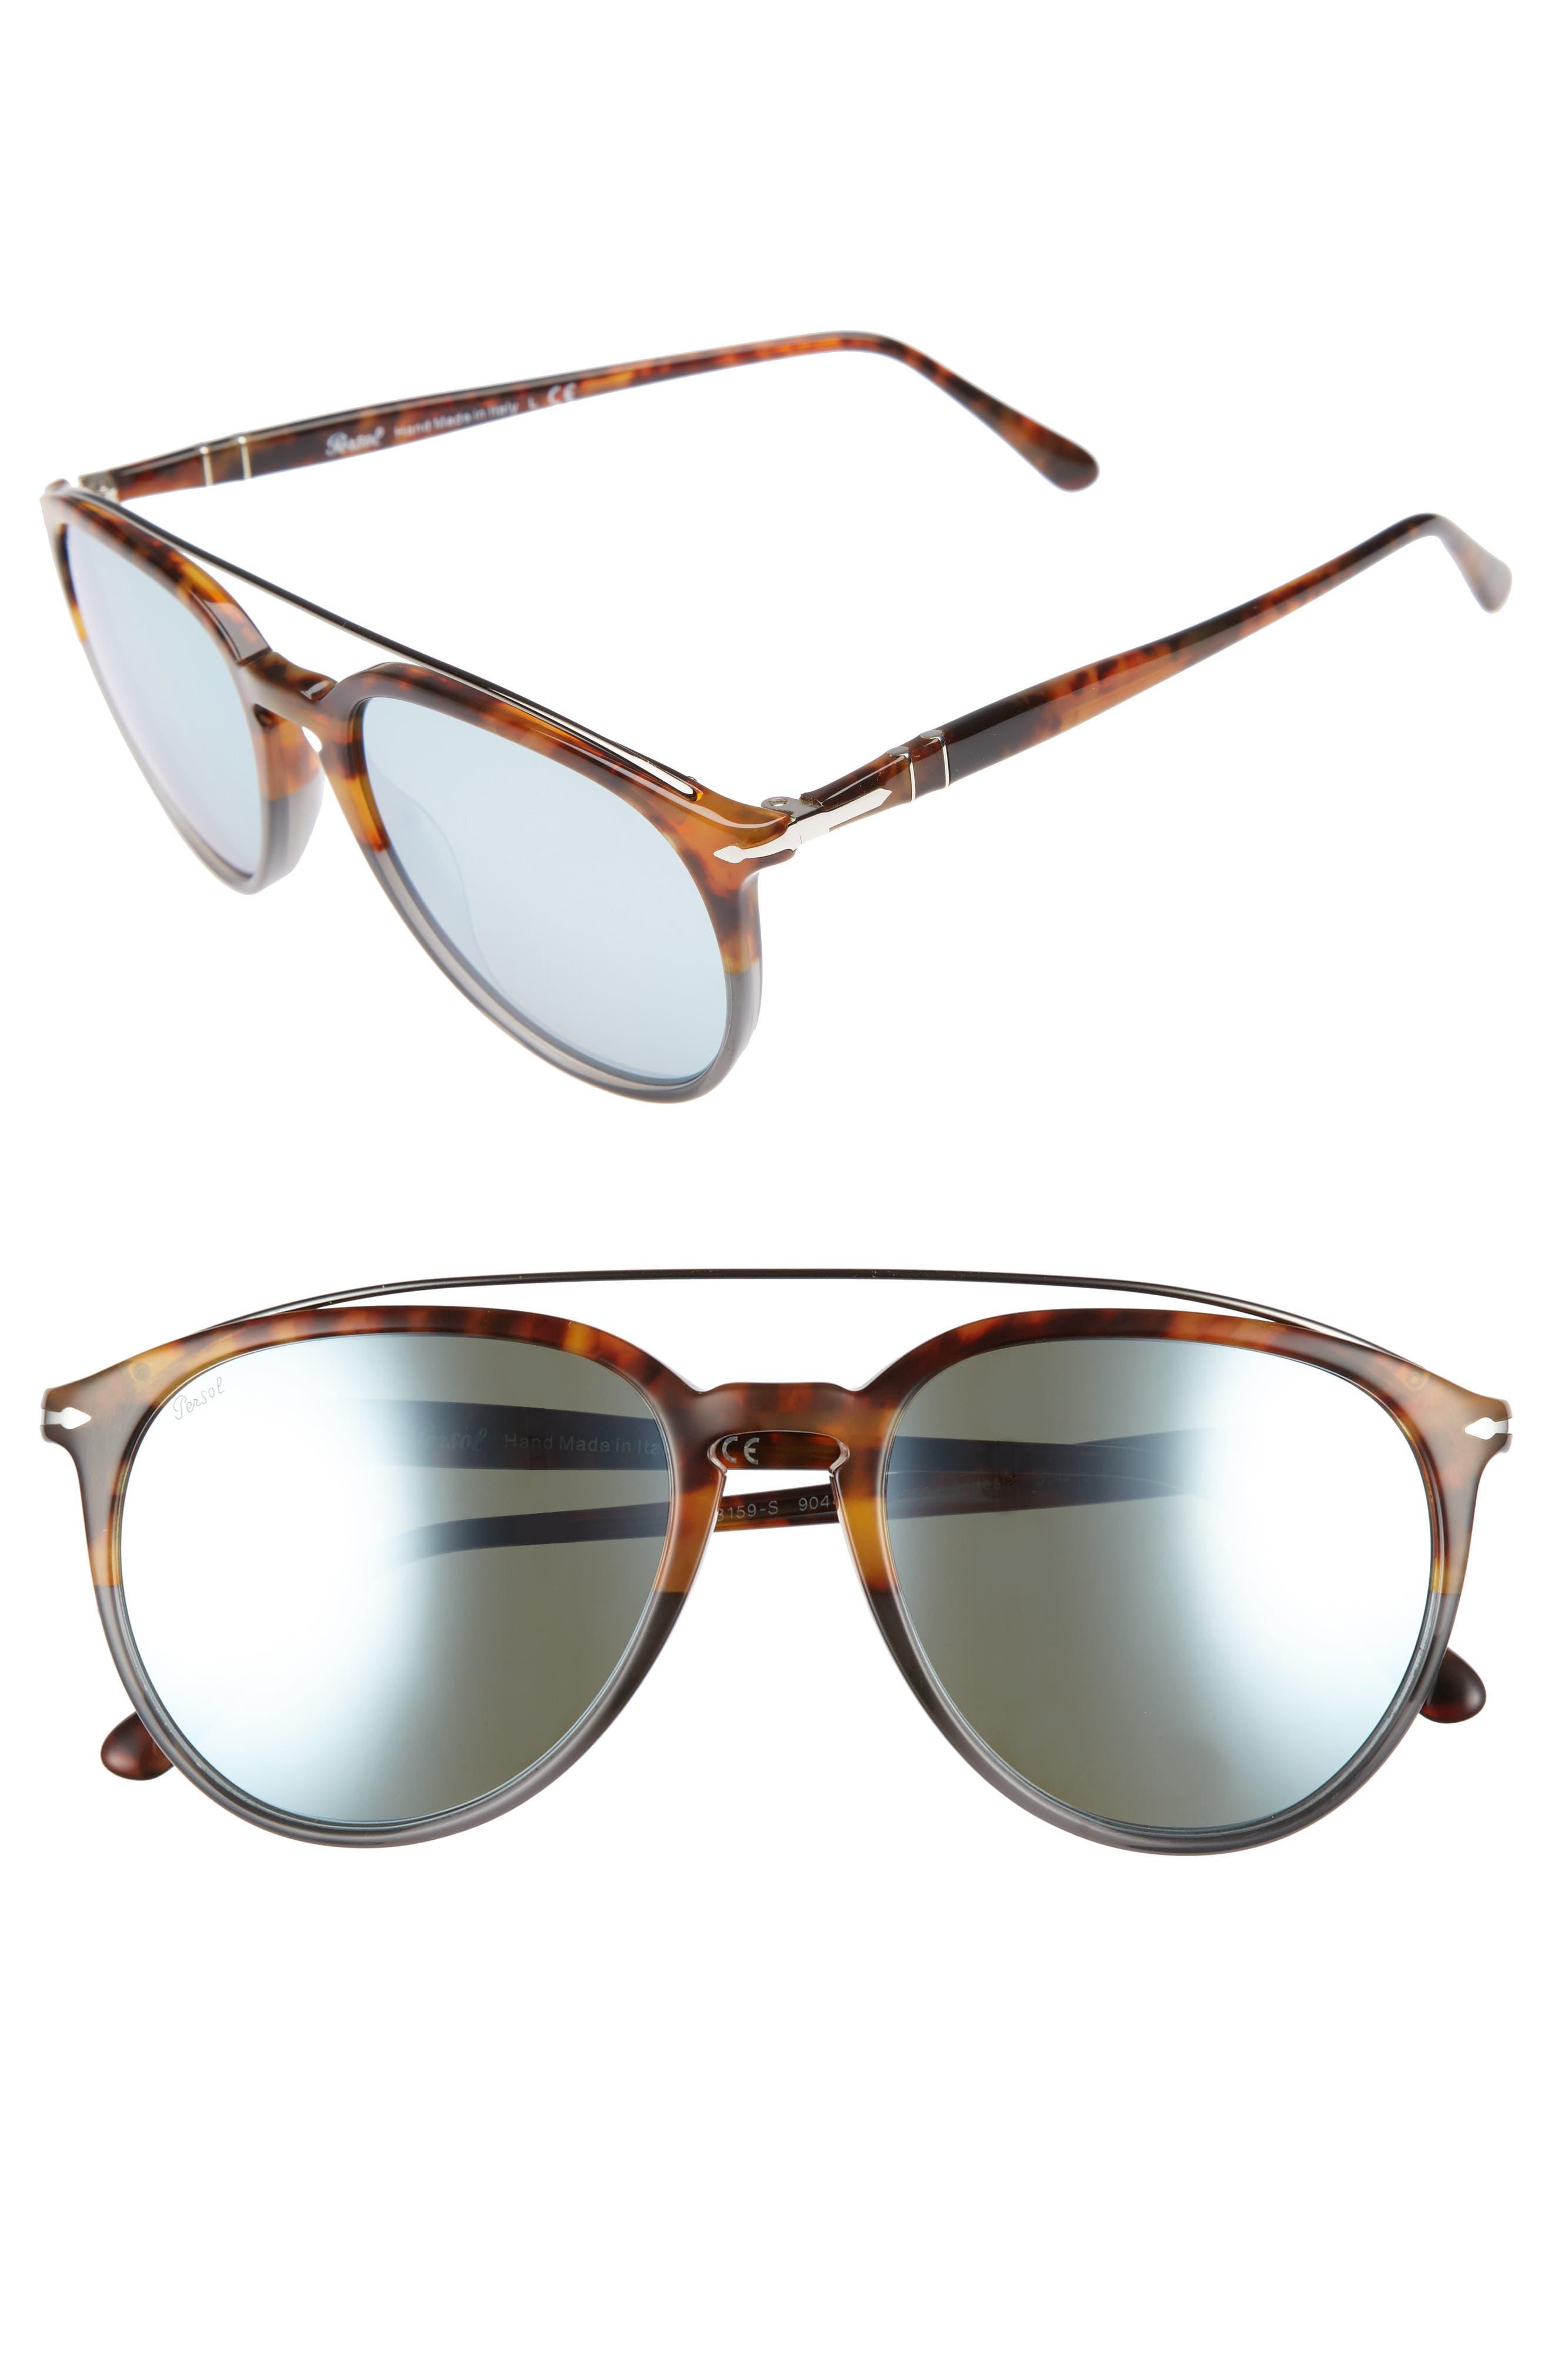 Sartoria 55mm Polarized Sunglasses,                         Main,                         color, 205